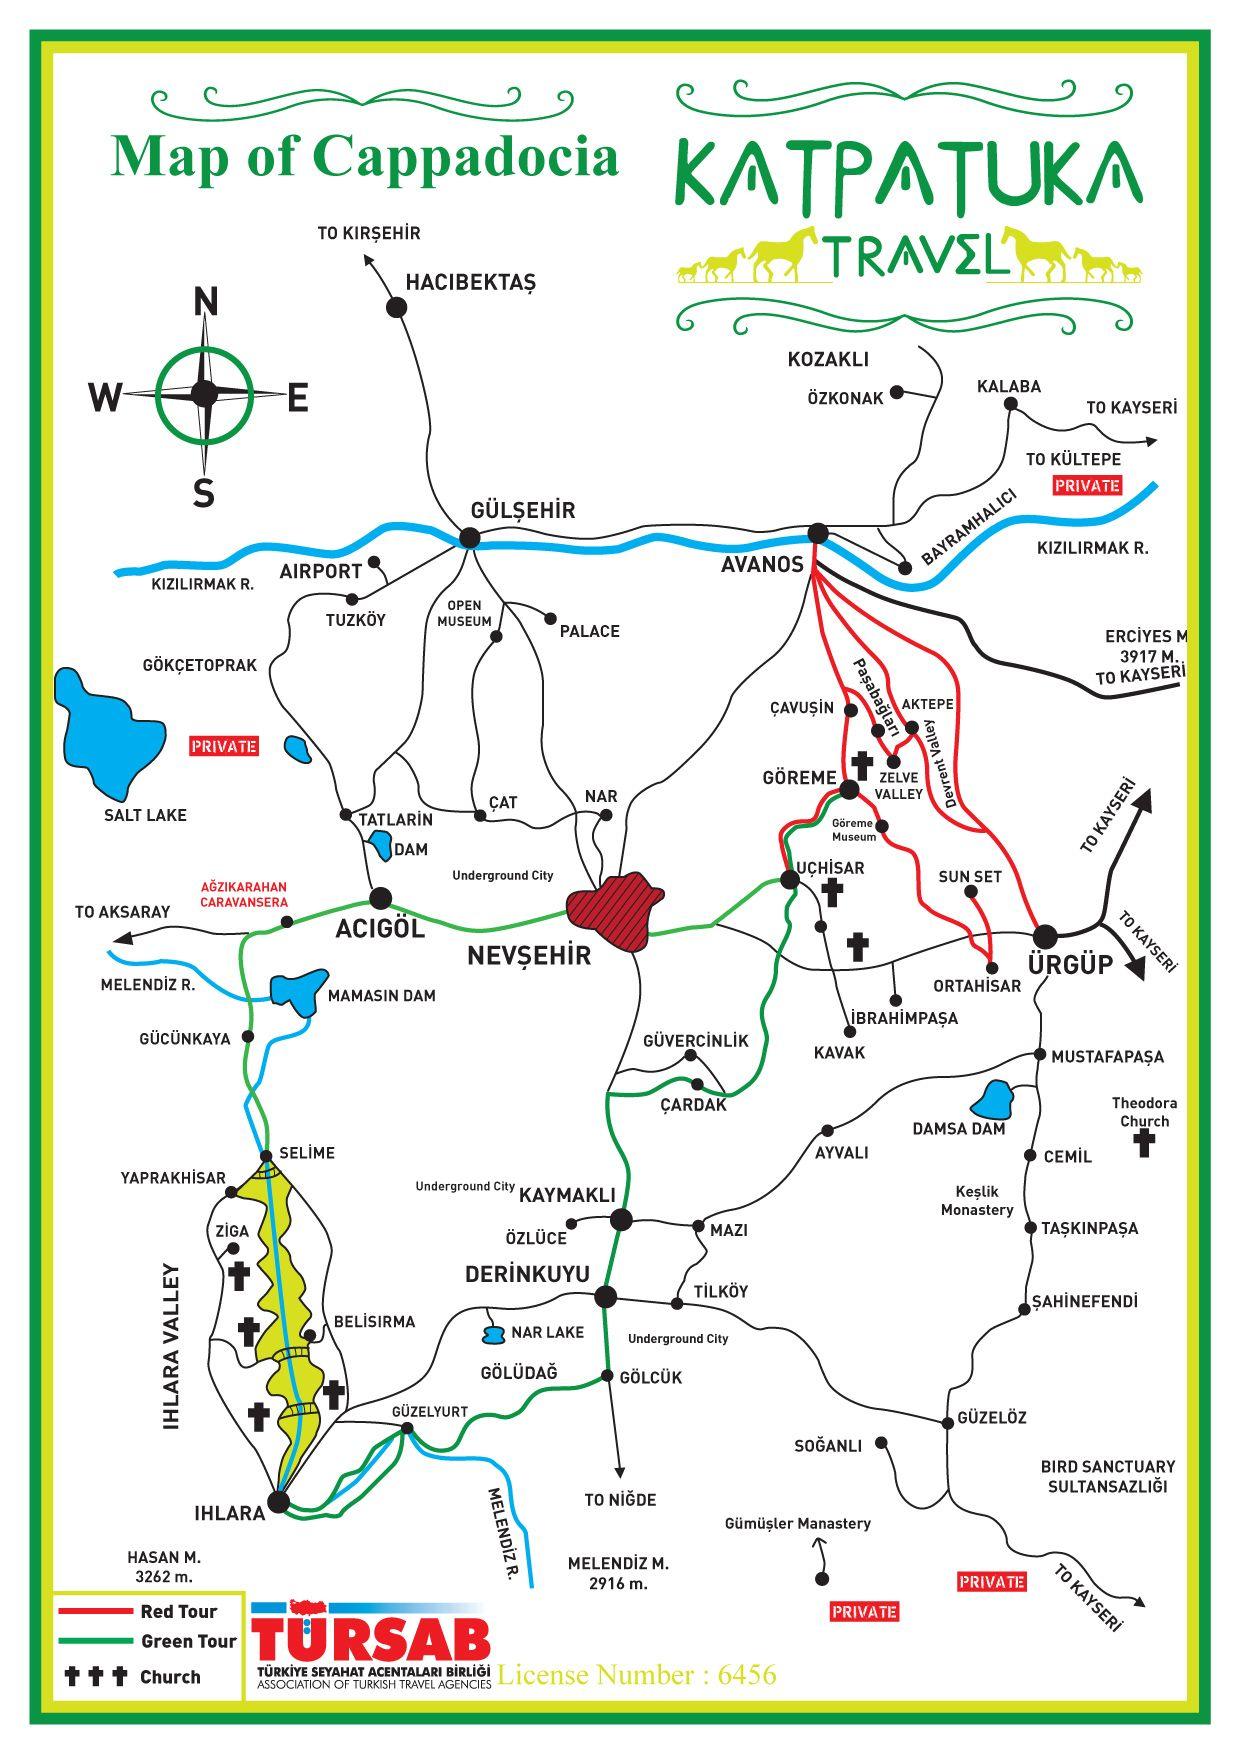 Pin by Doenting Cappadocia on Cappadocia Maps | Turkey ... Cappadocia Map on ardahan map, ankara map, dolmabahce palace map, pamukkale map, carpathian mountains map, anatolia map, turkey map, tatev monastery map, kayseri map, lycian sea map, macedonia map, bitlis map, nevsehir pazar map, cilicia map, underground city, mount nemrut, campania map, pontus map, troy map, goreme map, mount ararat, derinkuyu underground city, phthia map, ephesus map,